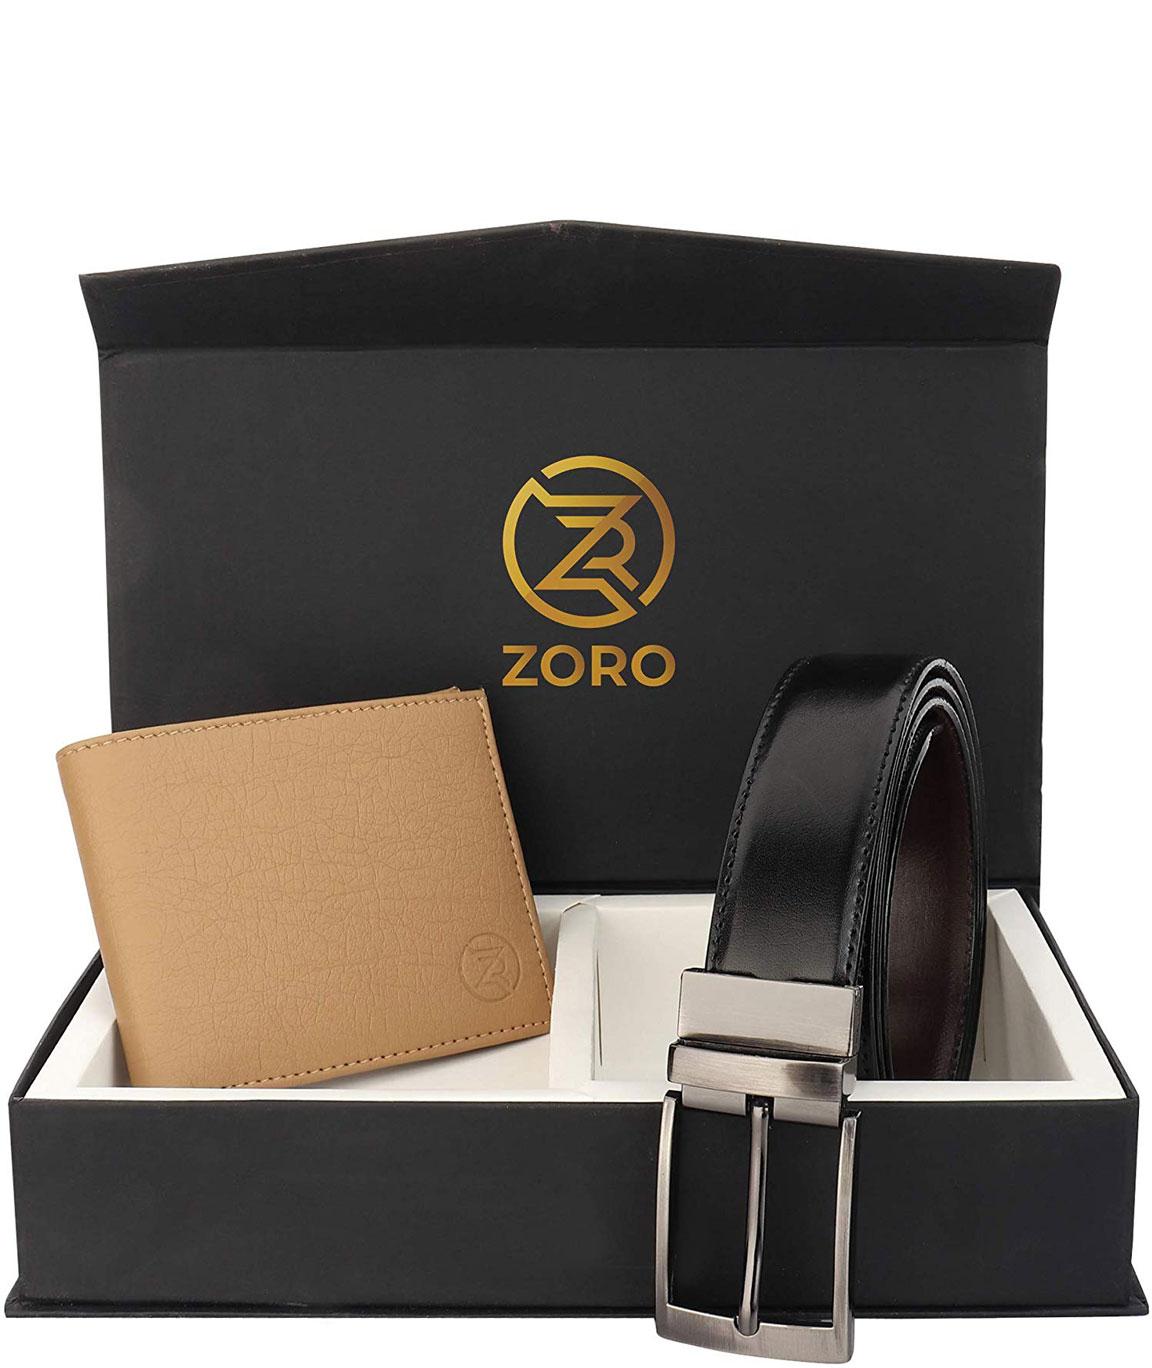 ZORO Reversible PU belt and wallet combo, formal black and brown reversible belt, gift for mens, gents belt, mens wallet ZR-TX01-31K